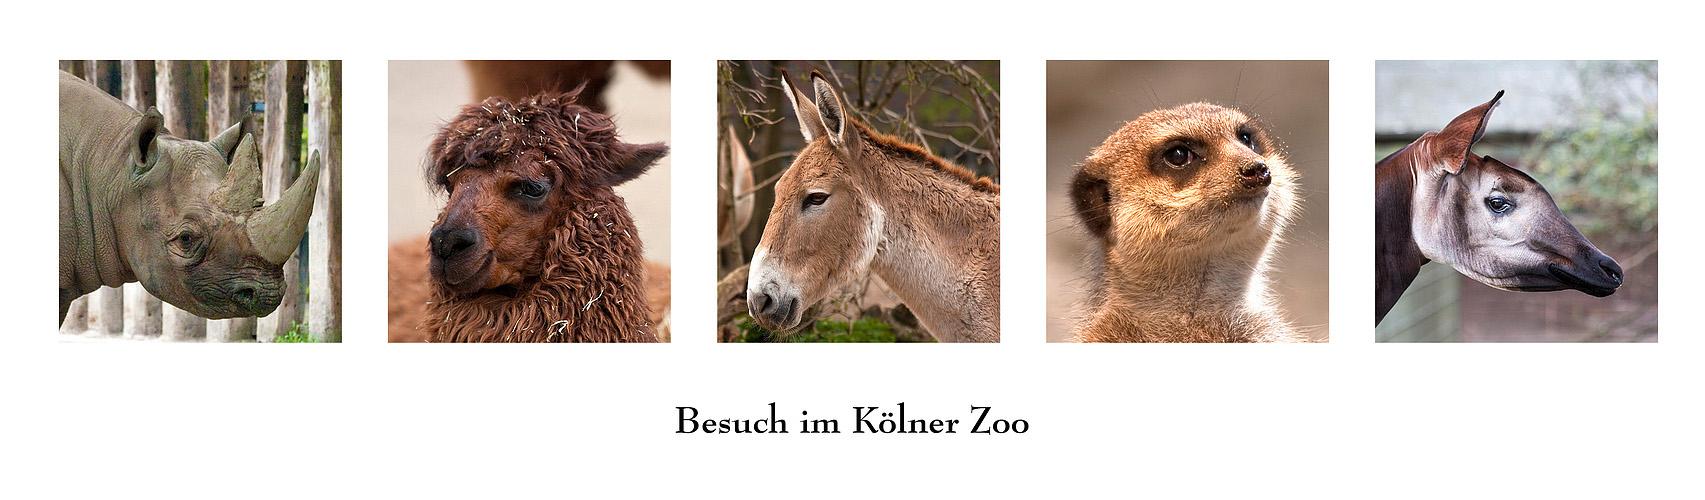 Kölner Zoo (1)